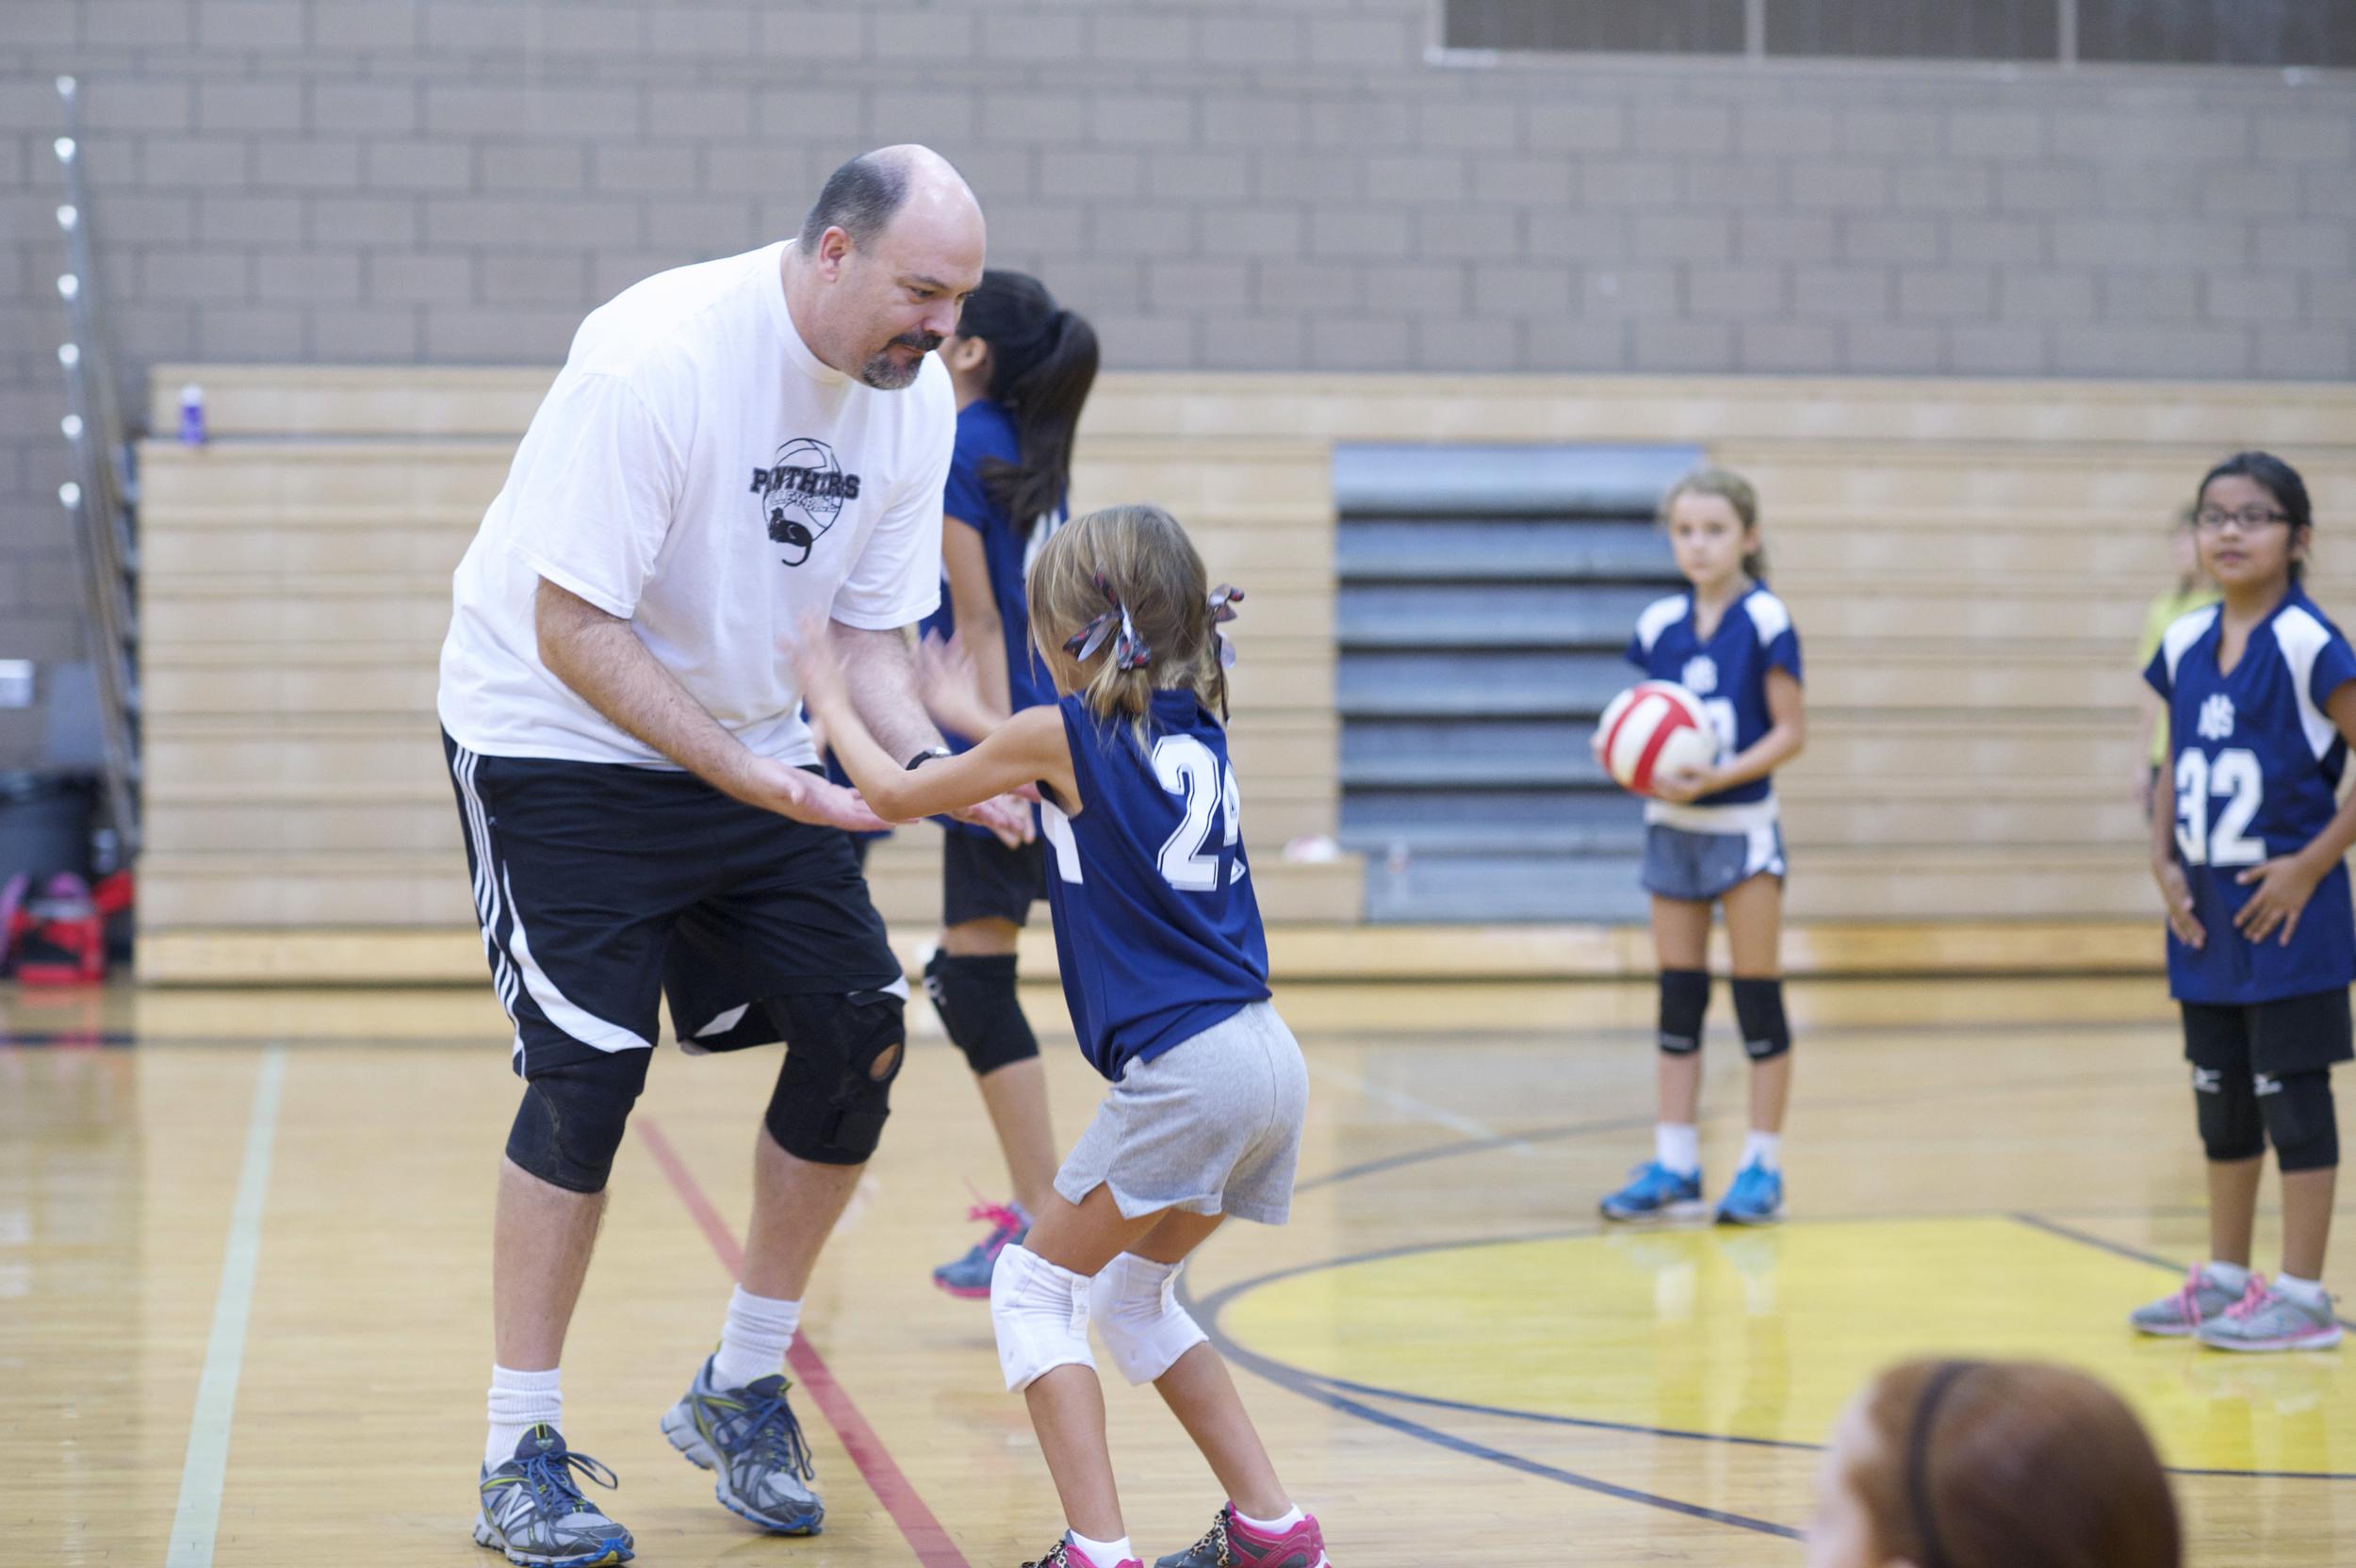 Coach giving the girls a little encouragement!